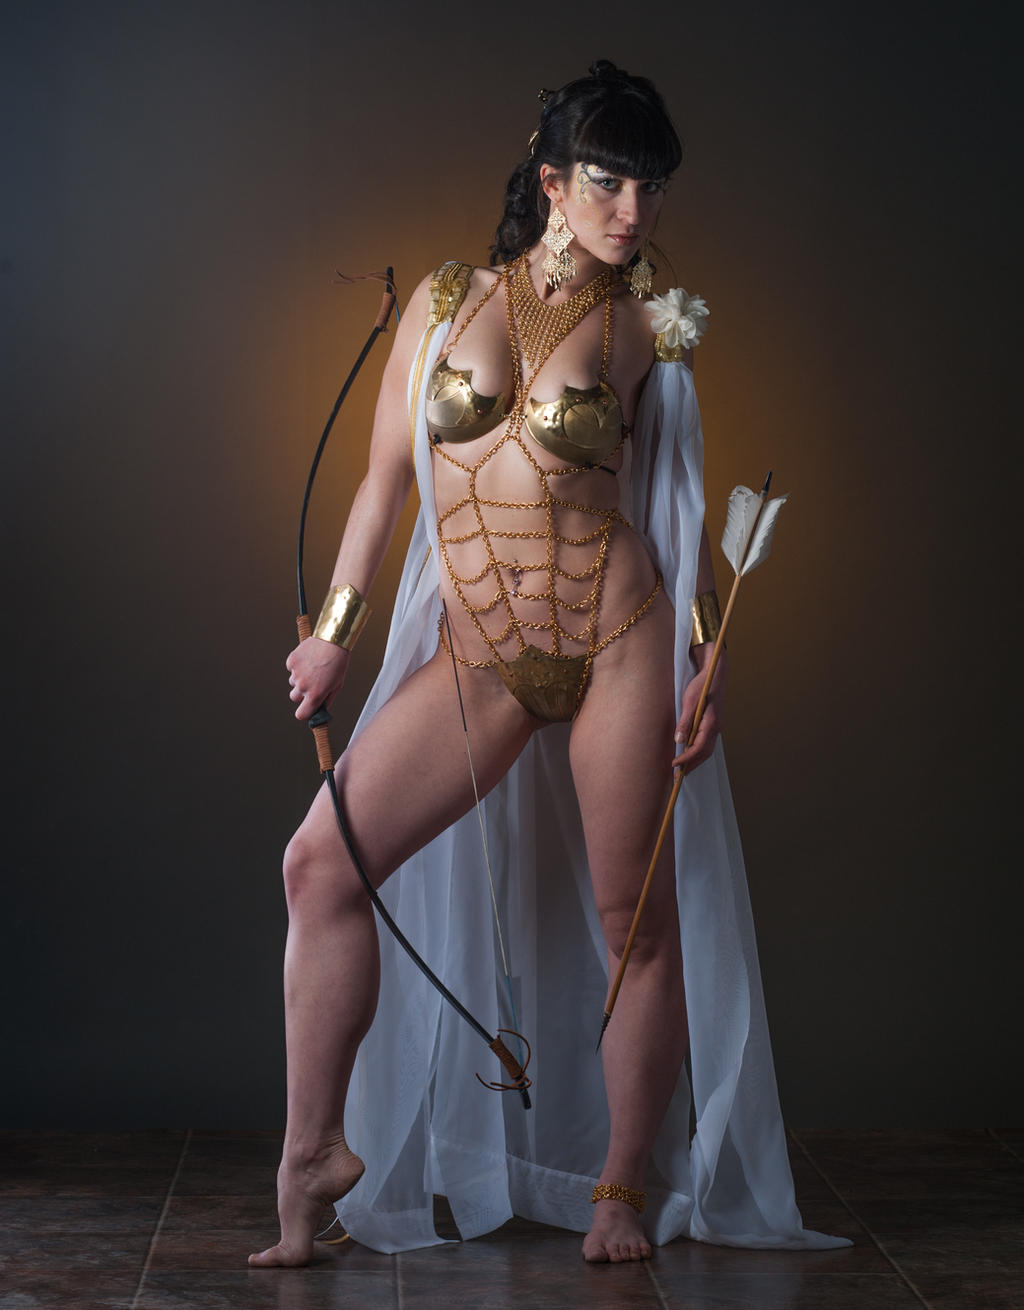 Tatiana Warrior 016 by jagged-eye